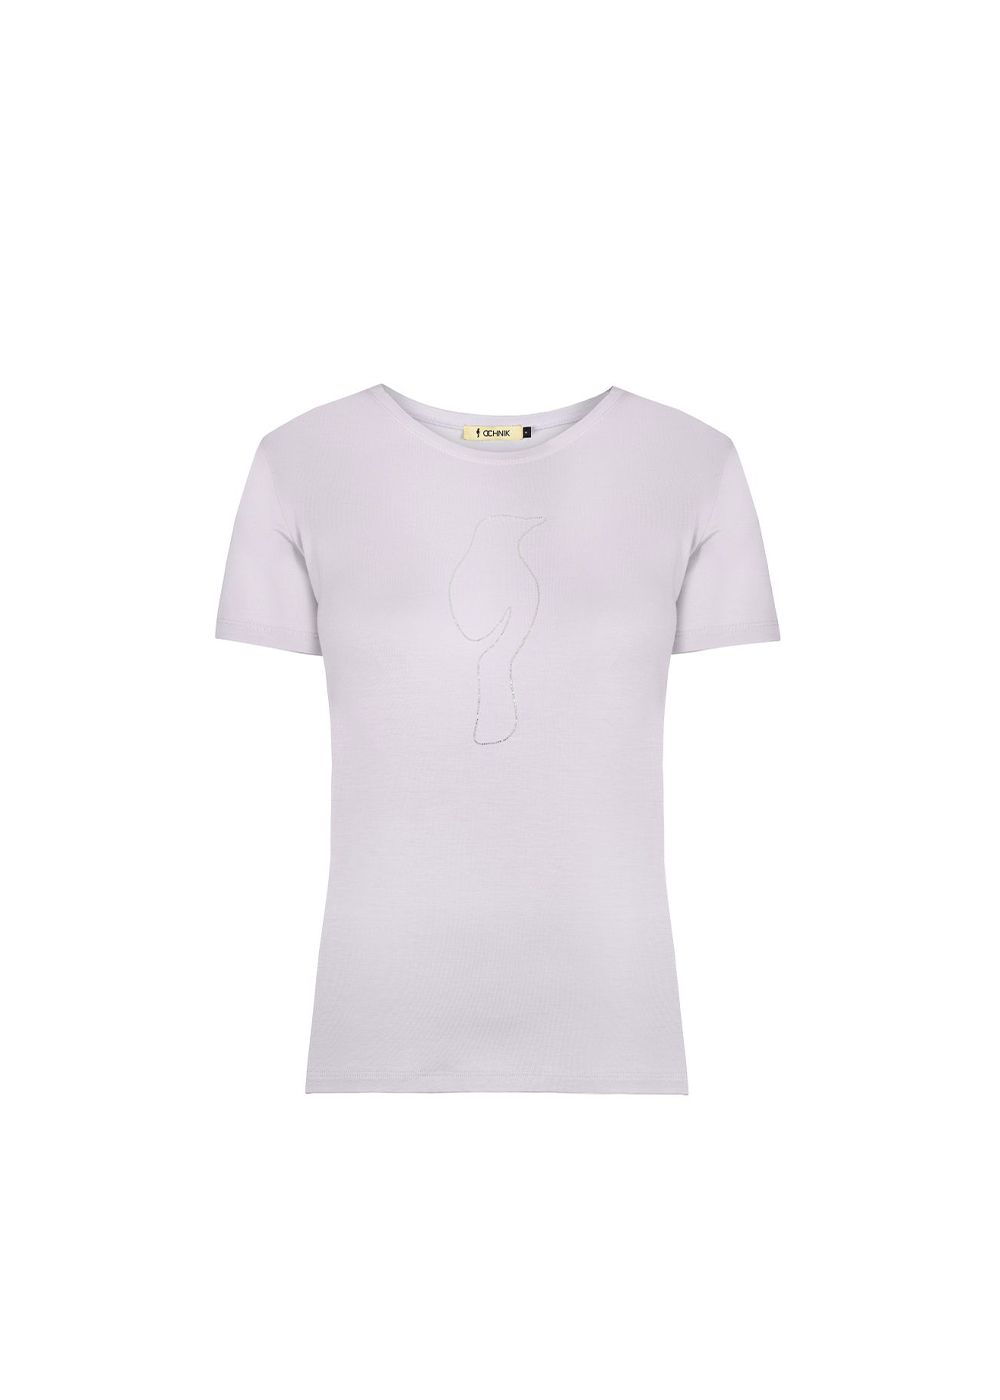 T-shirt damski TSHDT-0025-72(W19)